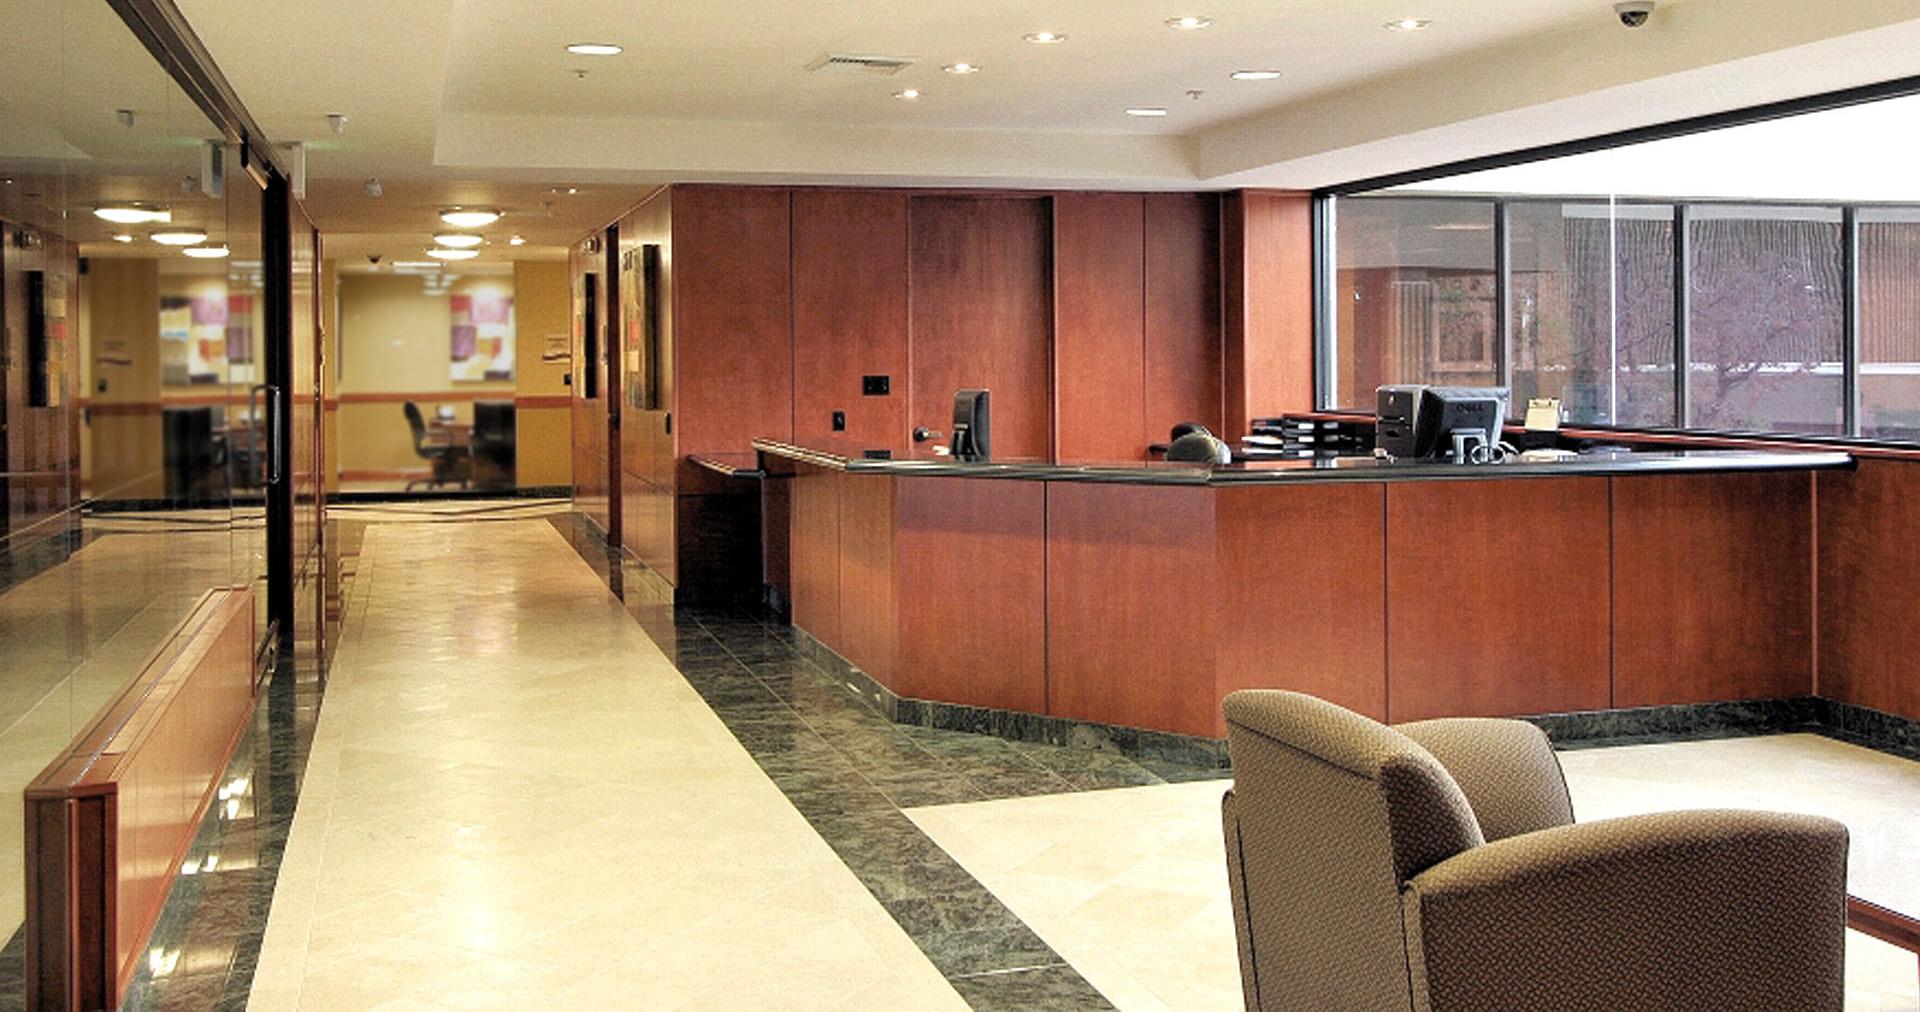 Image of desert adr's reception area. Desert adr. judge taylor.